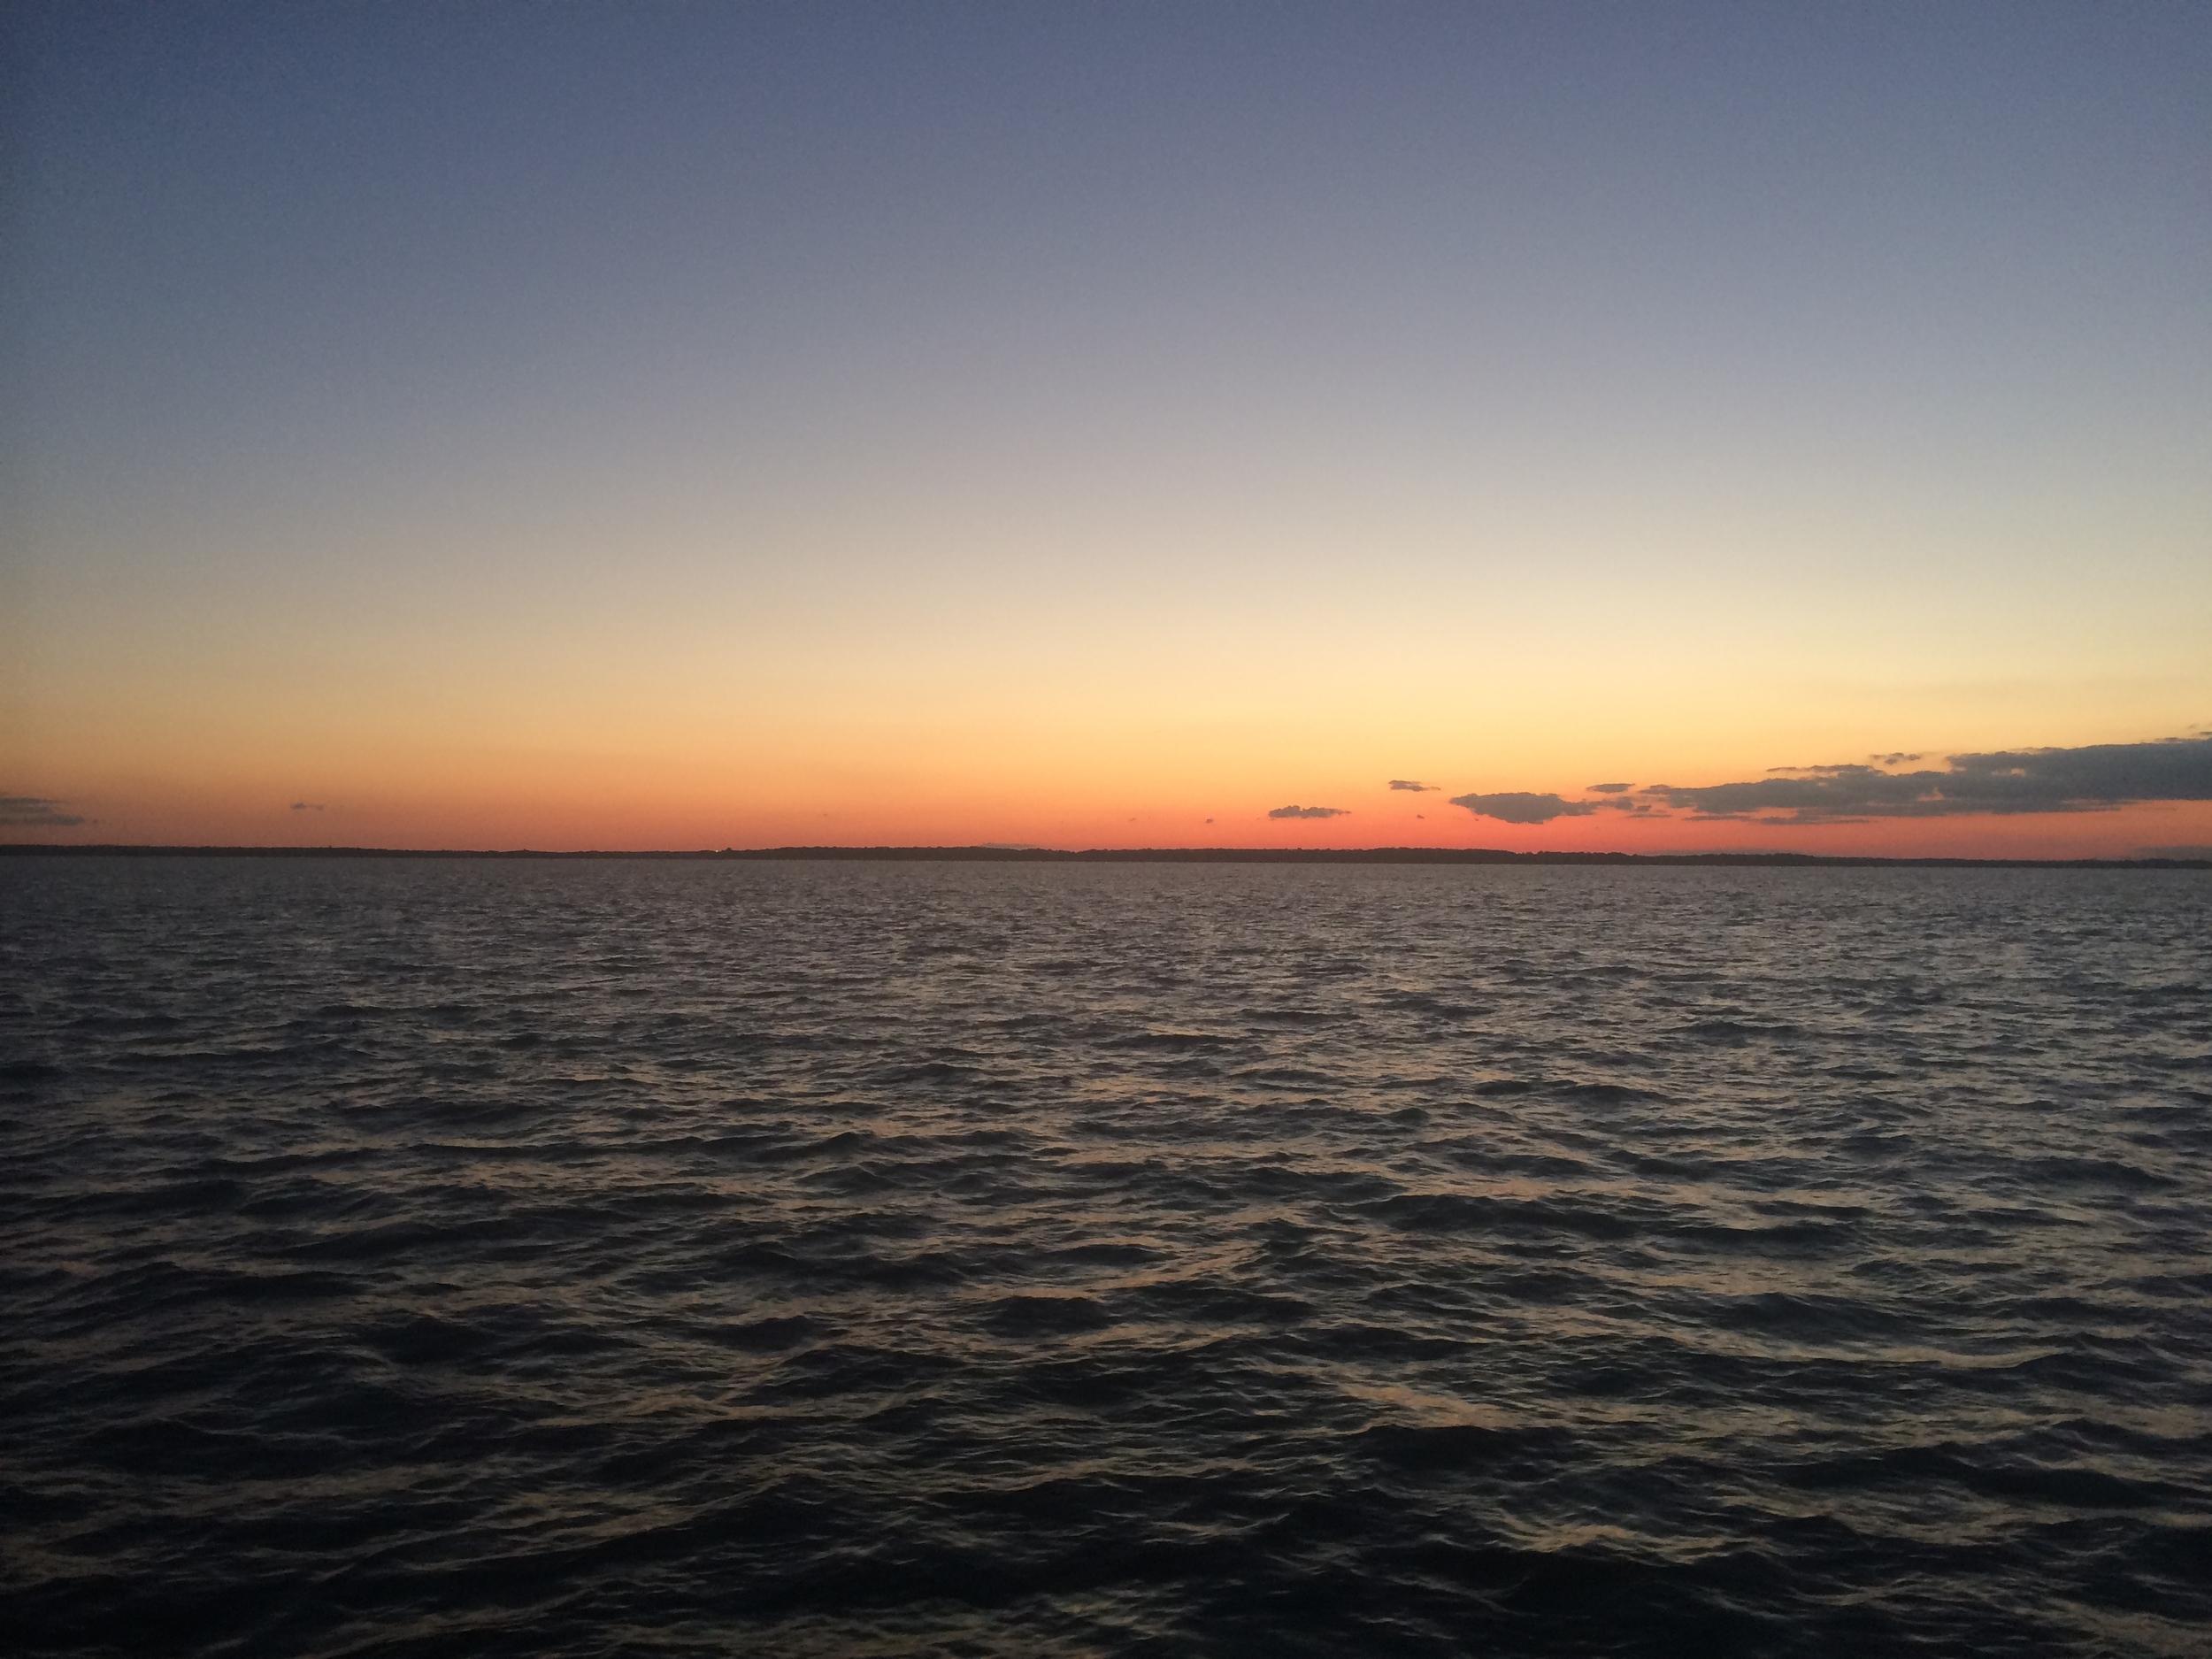 Sunset, my last day on fezywig.